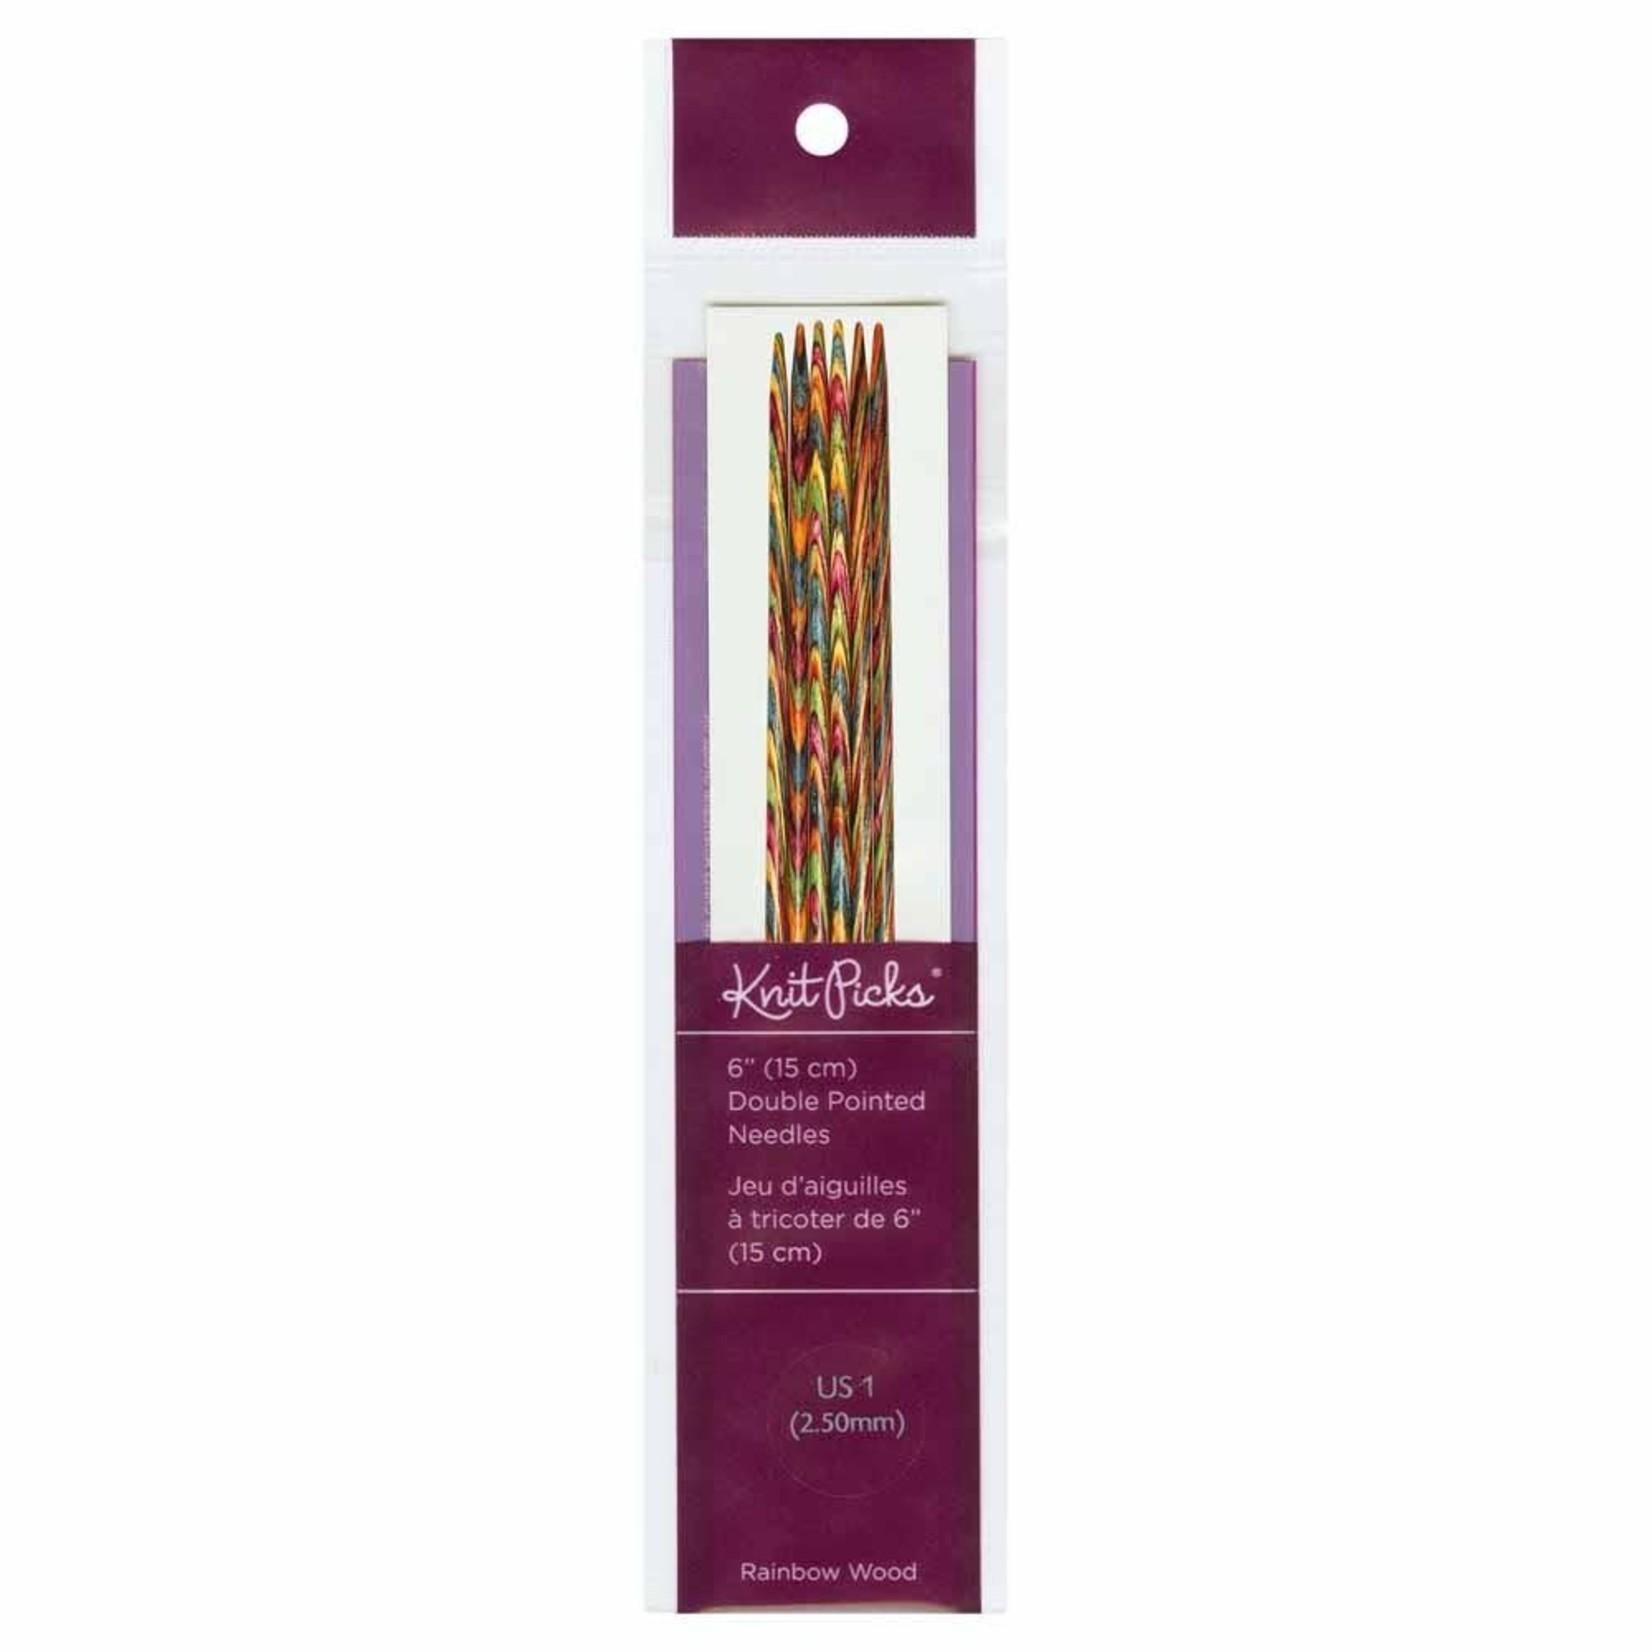 "Knit Picks KNIT PICKS Rainbow Wood Double Point Knitting Needles 15cm (6"")"